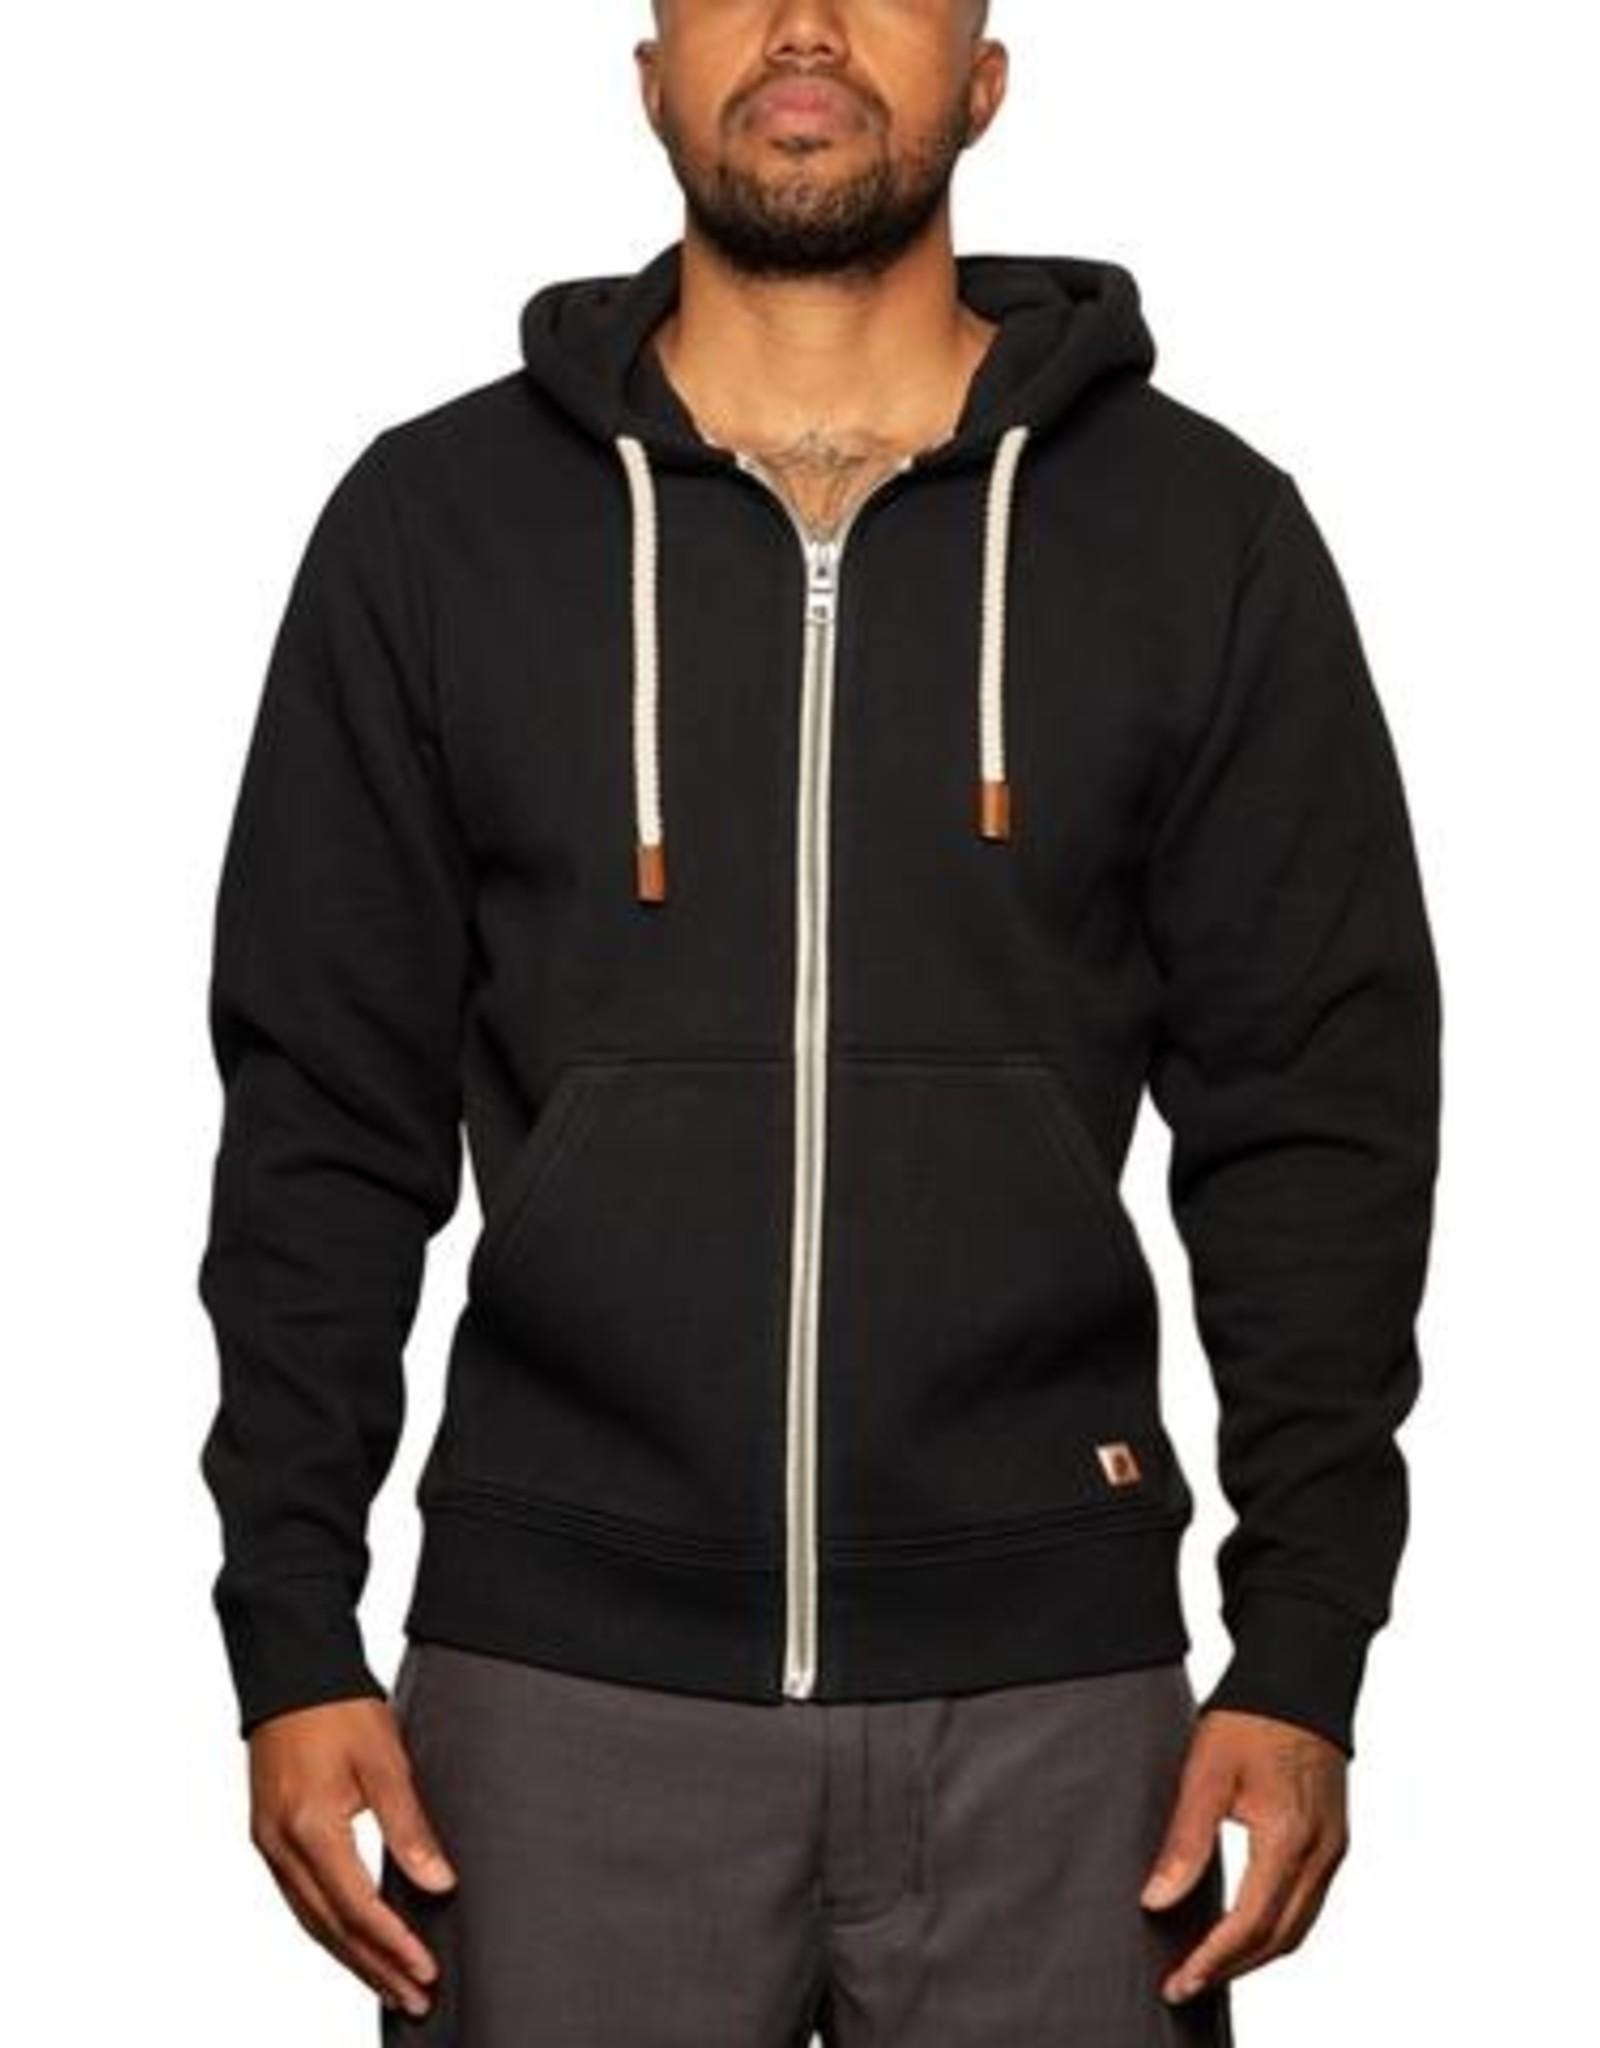 Fundamental Coast 1/4 quarter zip hoodie